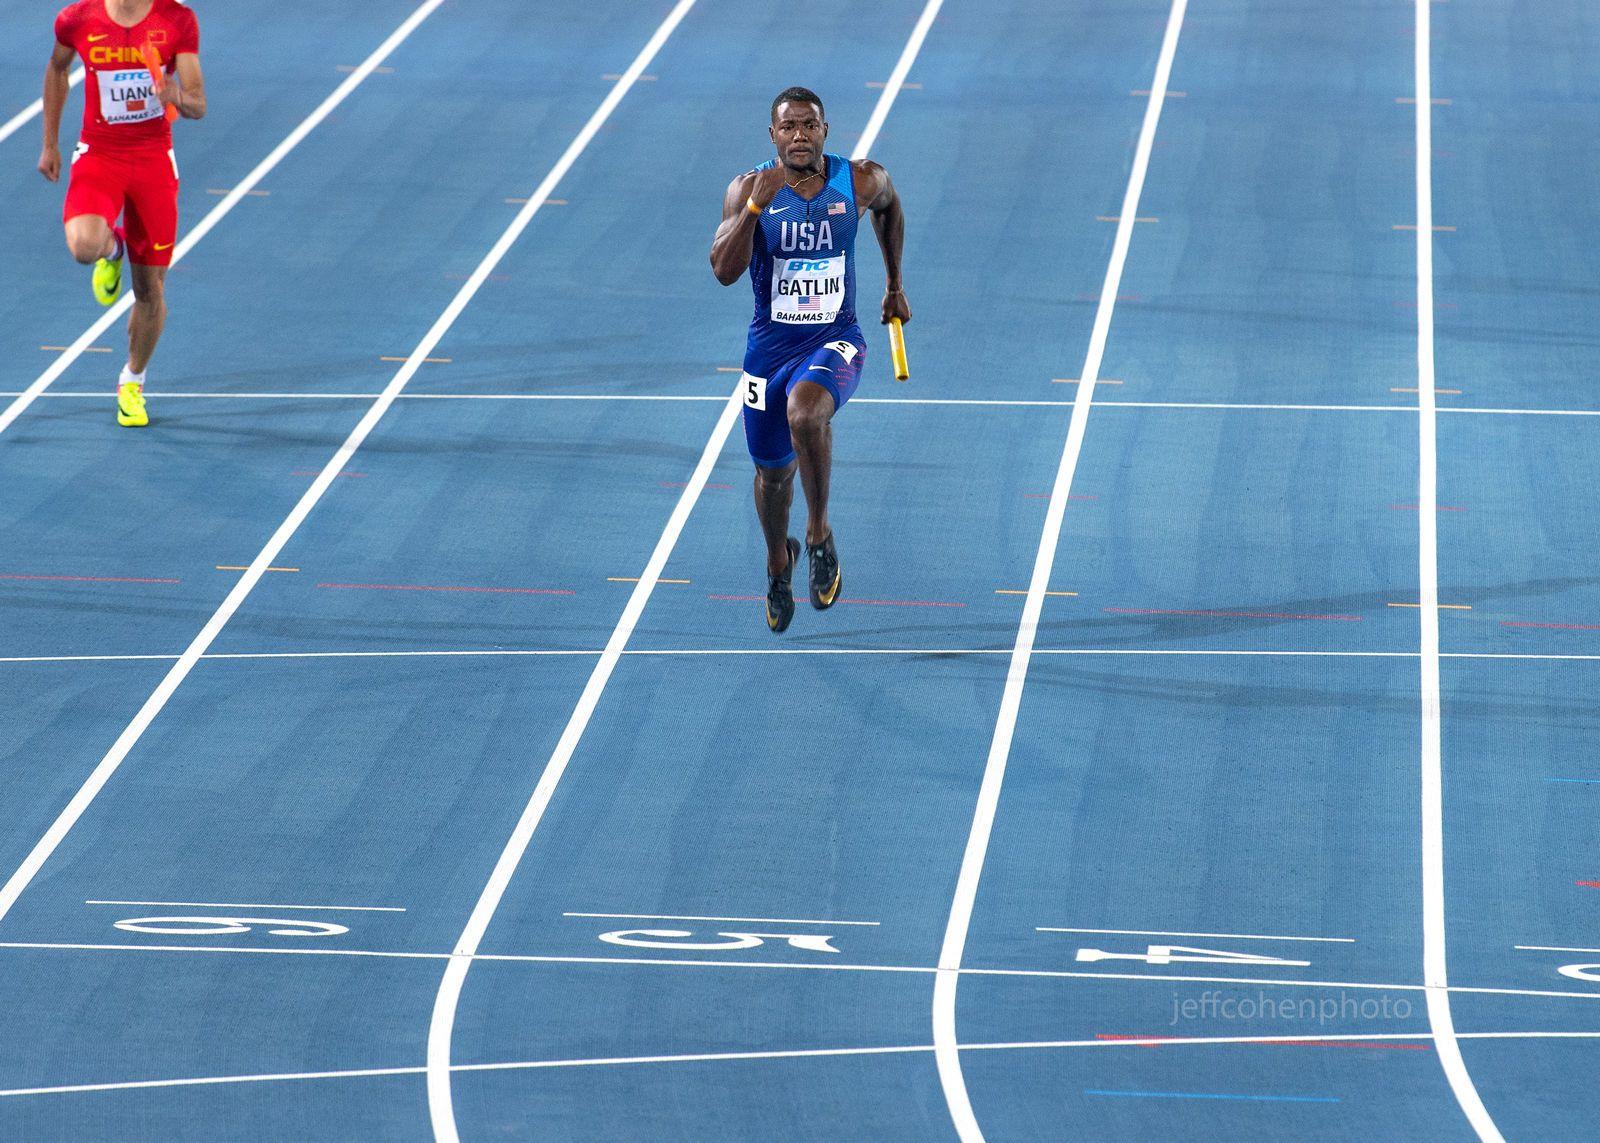 1r2017_bahamas_relays_day_1_gatlin_b__4x100_finish___jeff_cohen_photo__2833_web.jpg